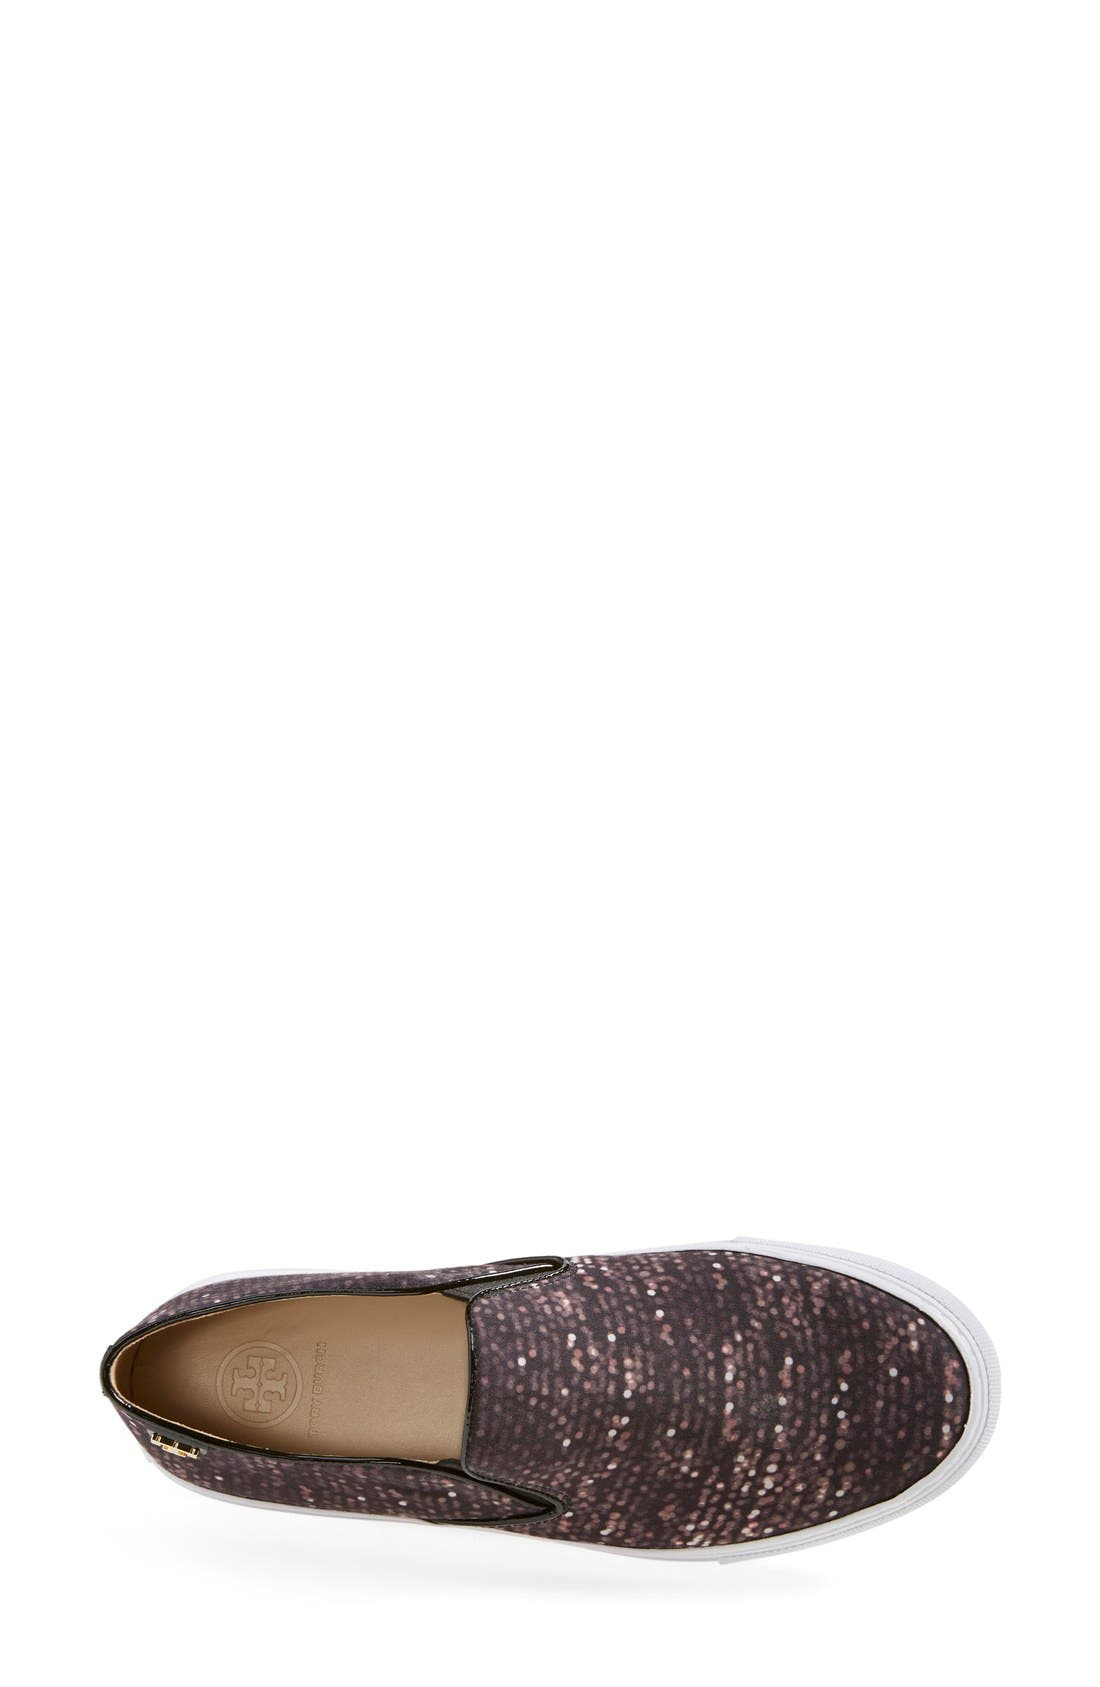 Alternate Image 3  - Tory Burch Print Slip-On Sneaker (Women)